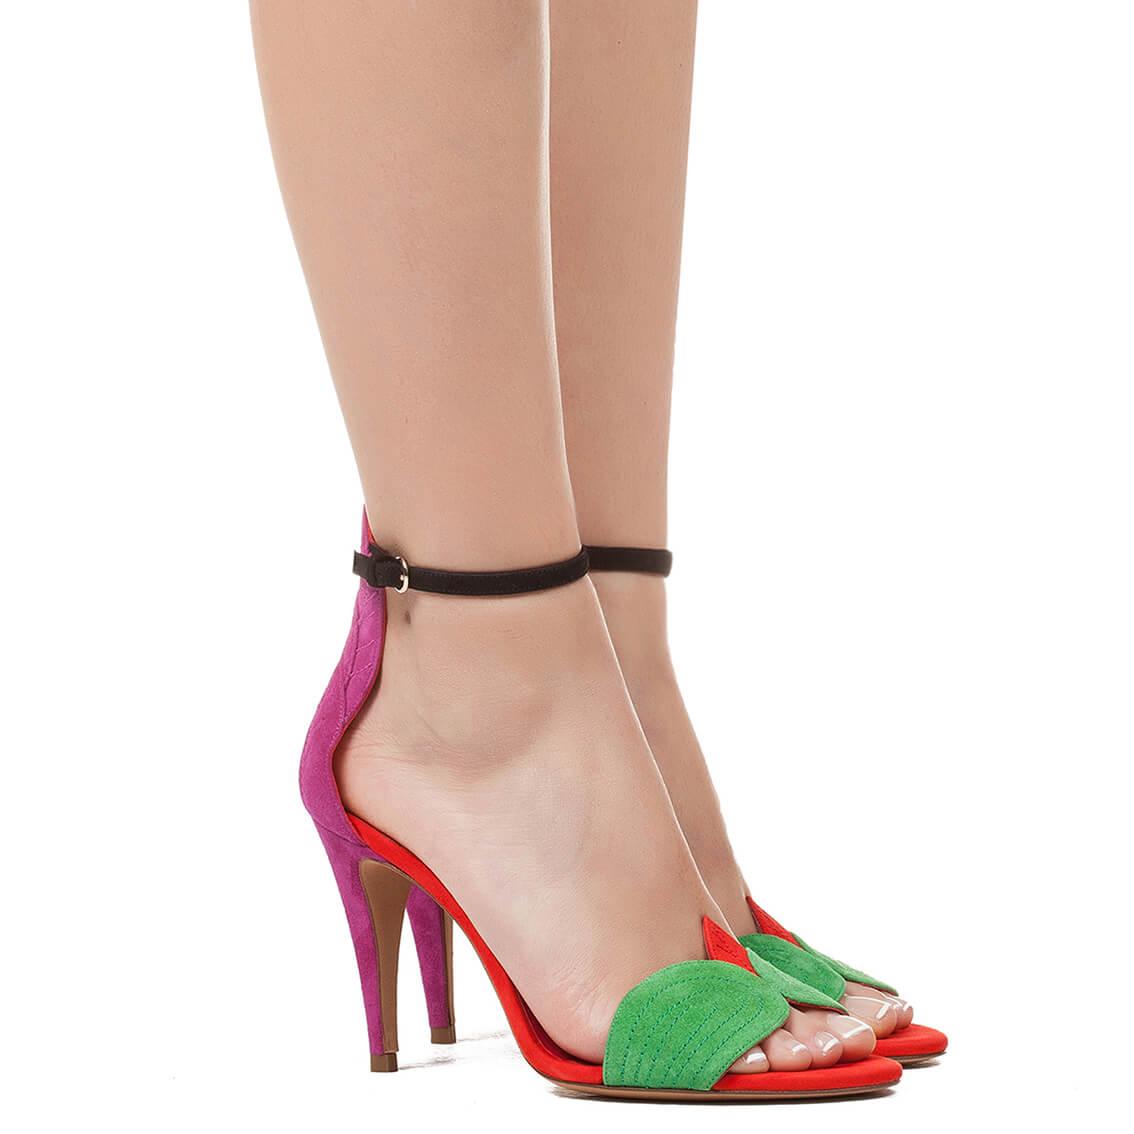 6a0a85da05f1 Ankle strap high heel sandals - online shoe store Pura Lopez . PURA ...